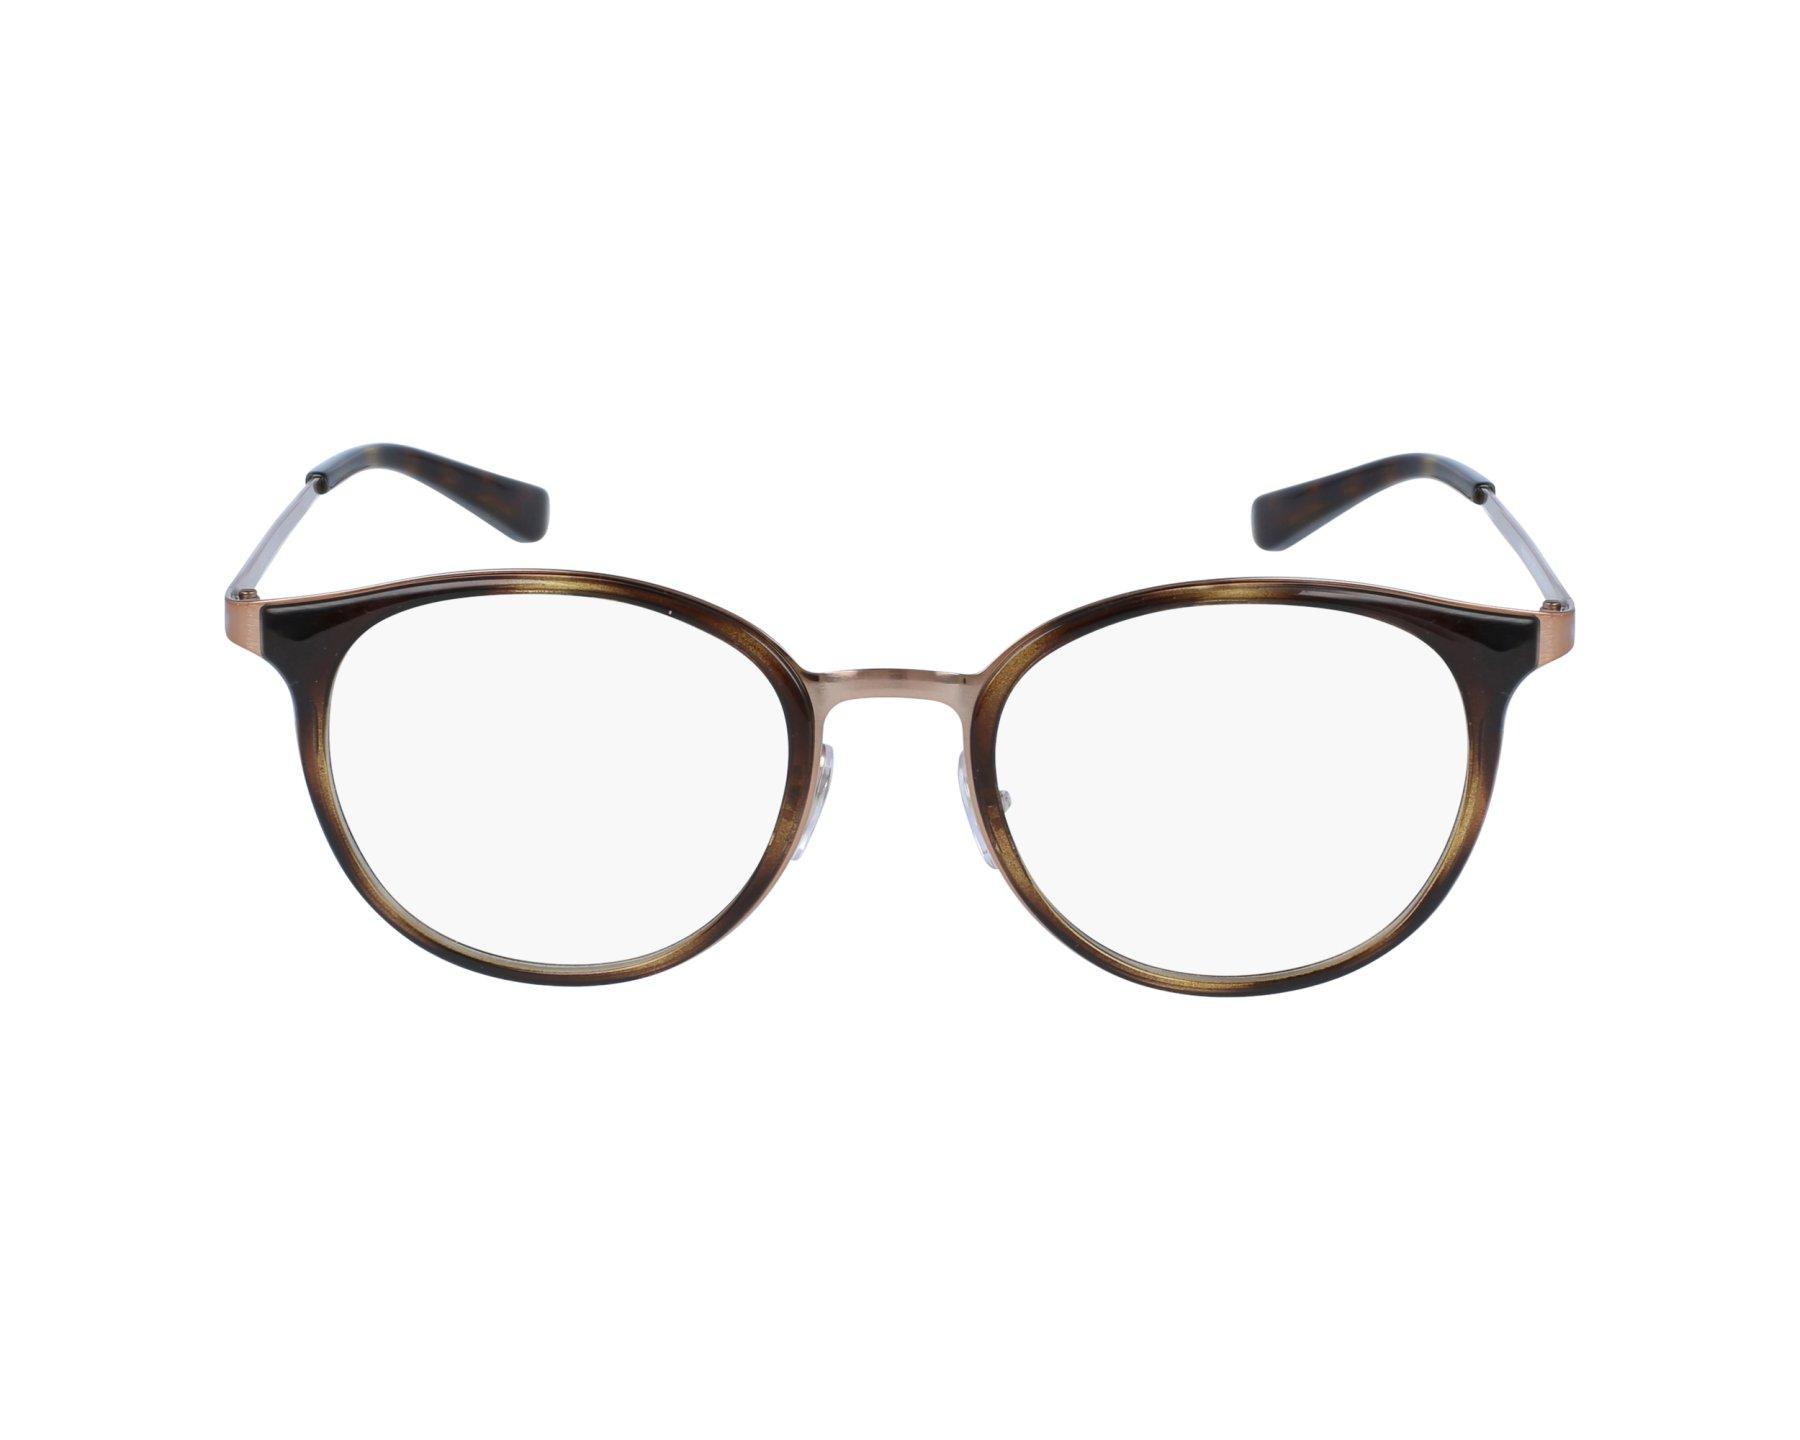 46bbf39cffb eyeglasses Ray-Ban RX-6372-M 2732 50-19 Bronze Havana profile